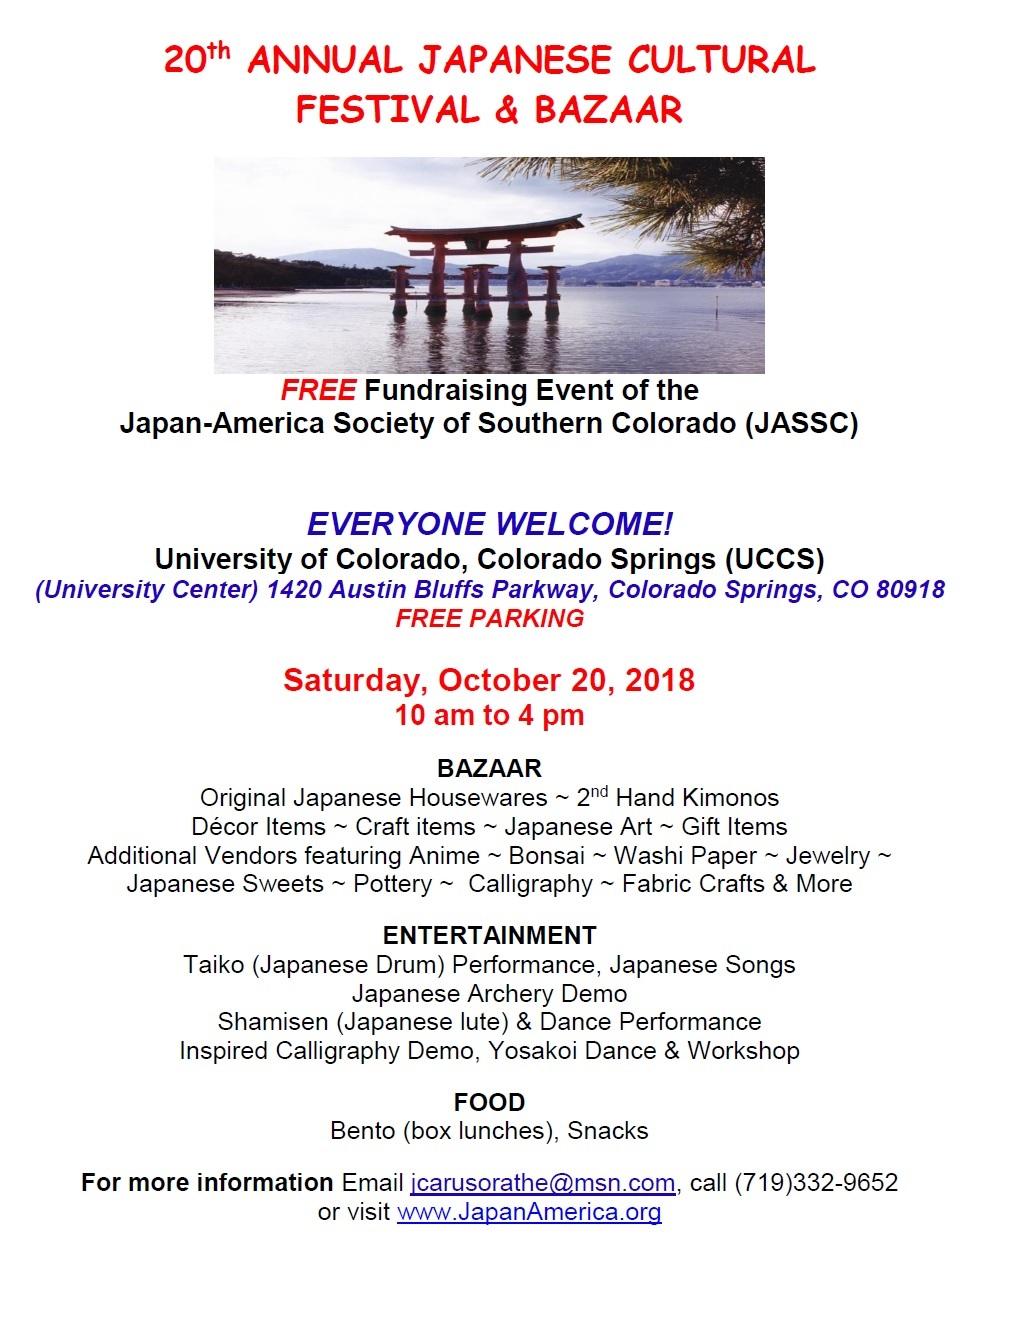 JASSC culture bazaar.jpg